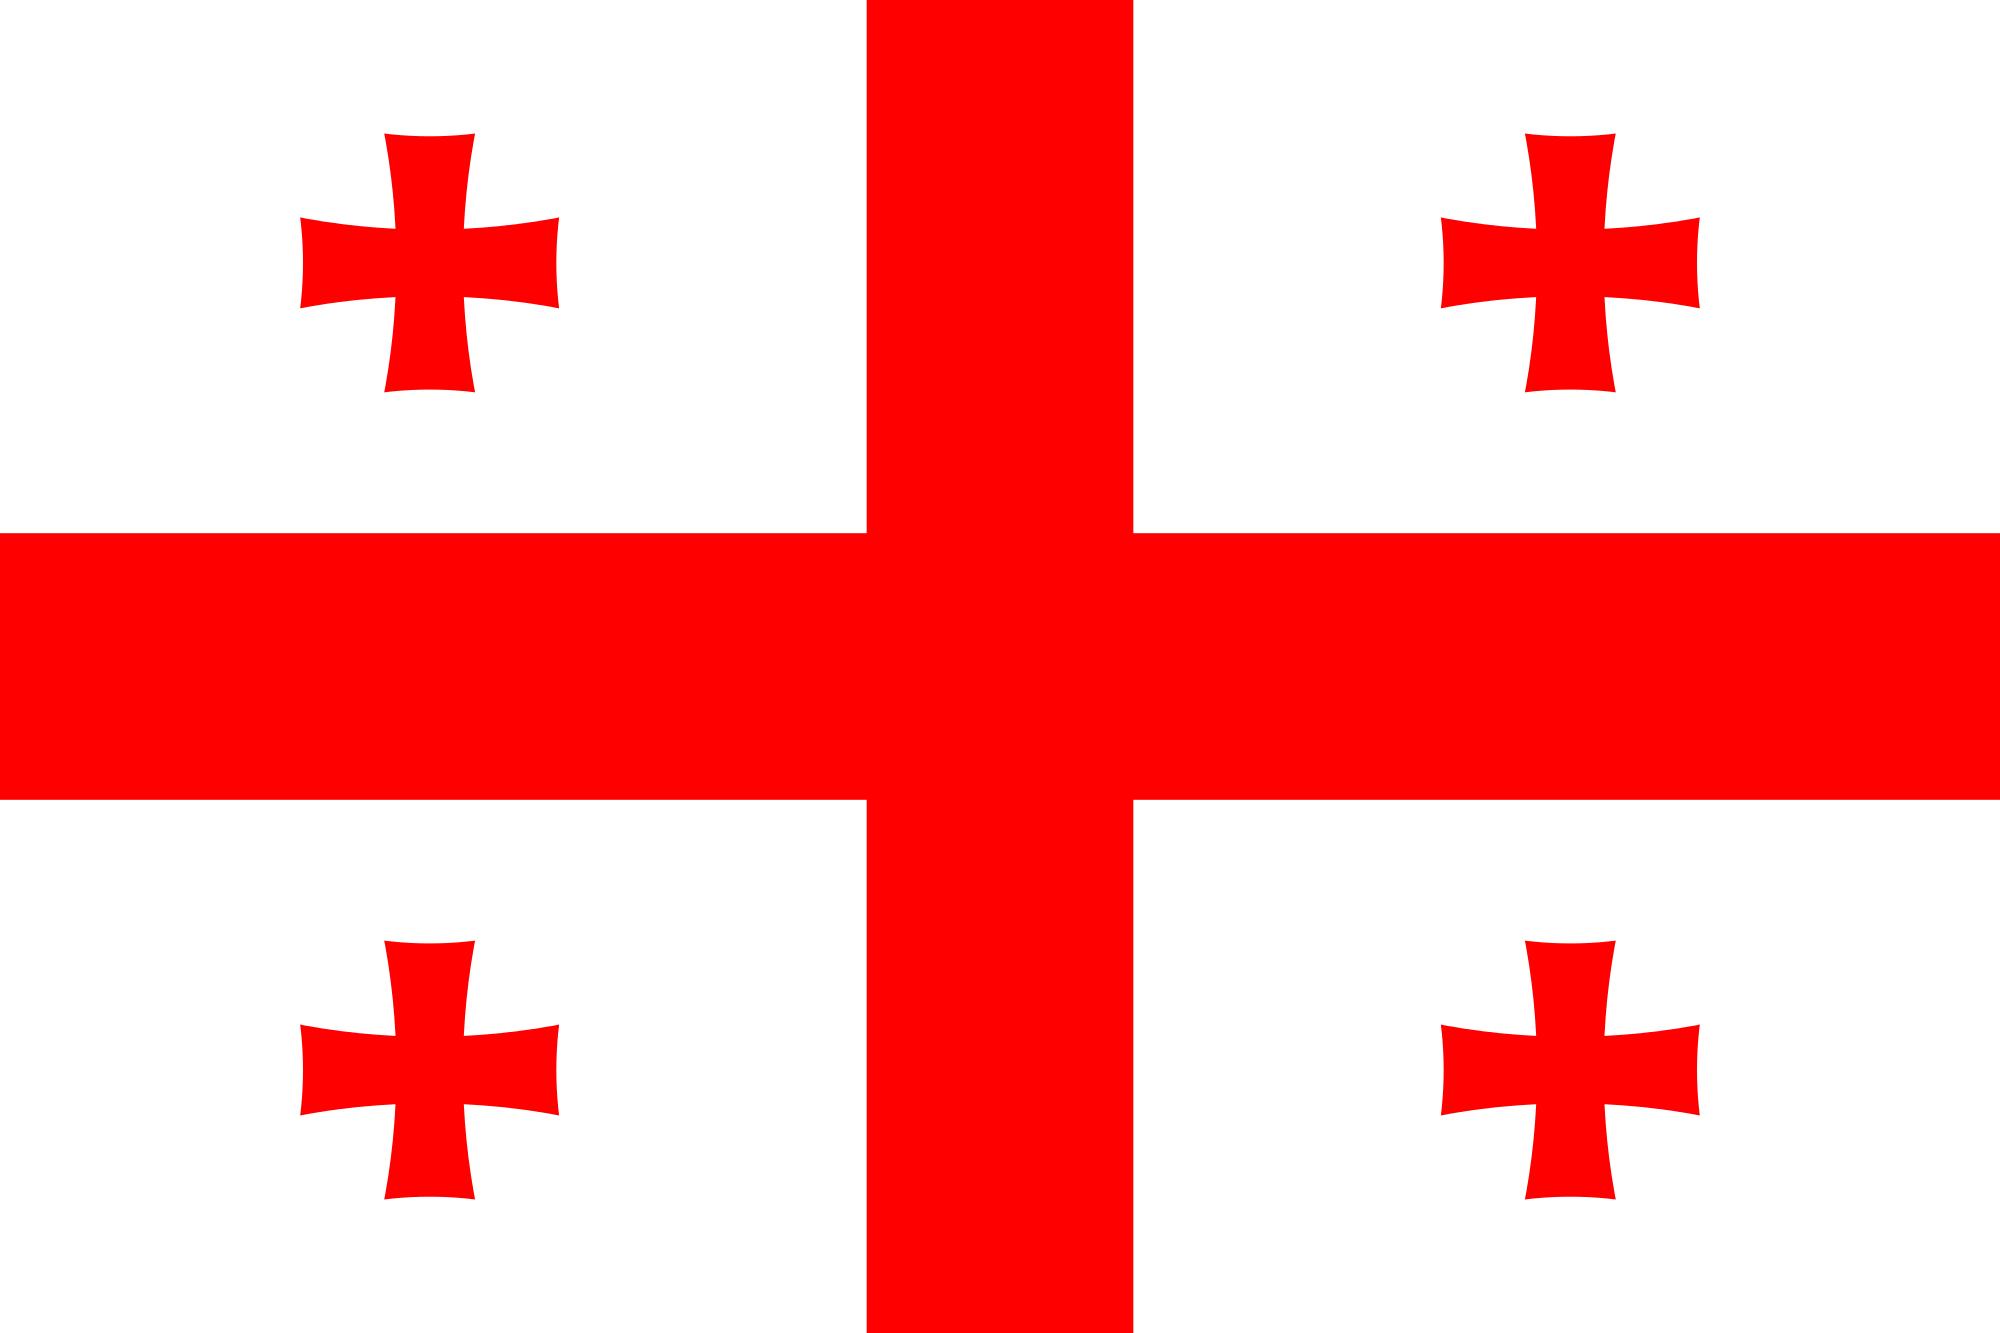 Image of the new Georgia flag.